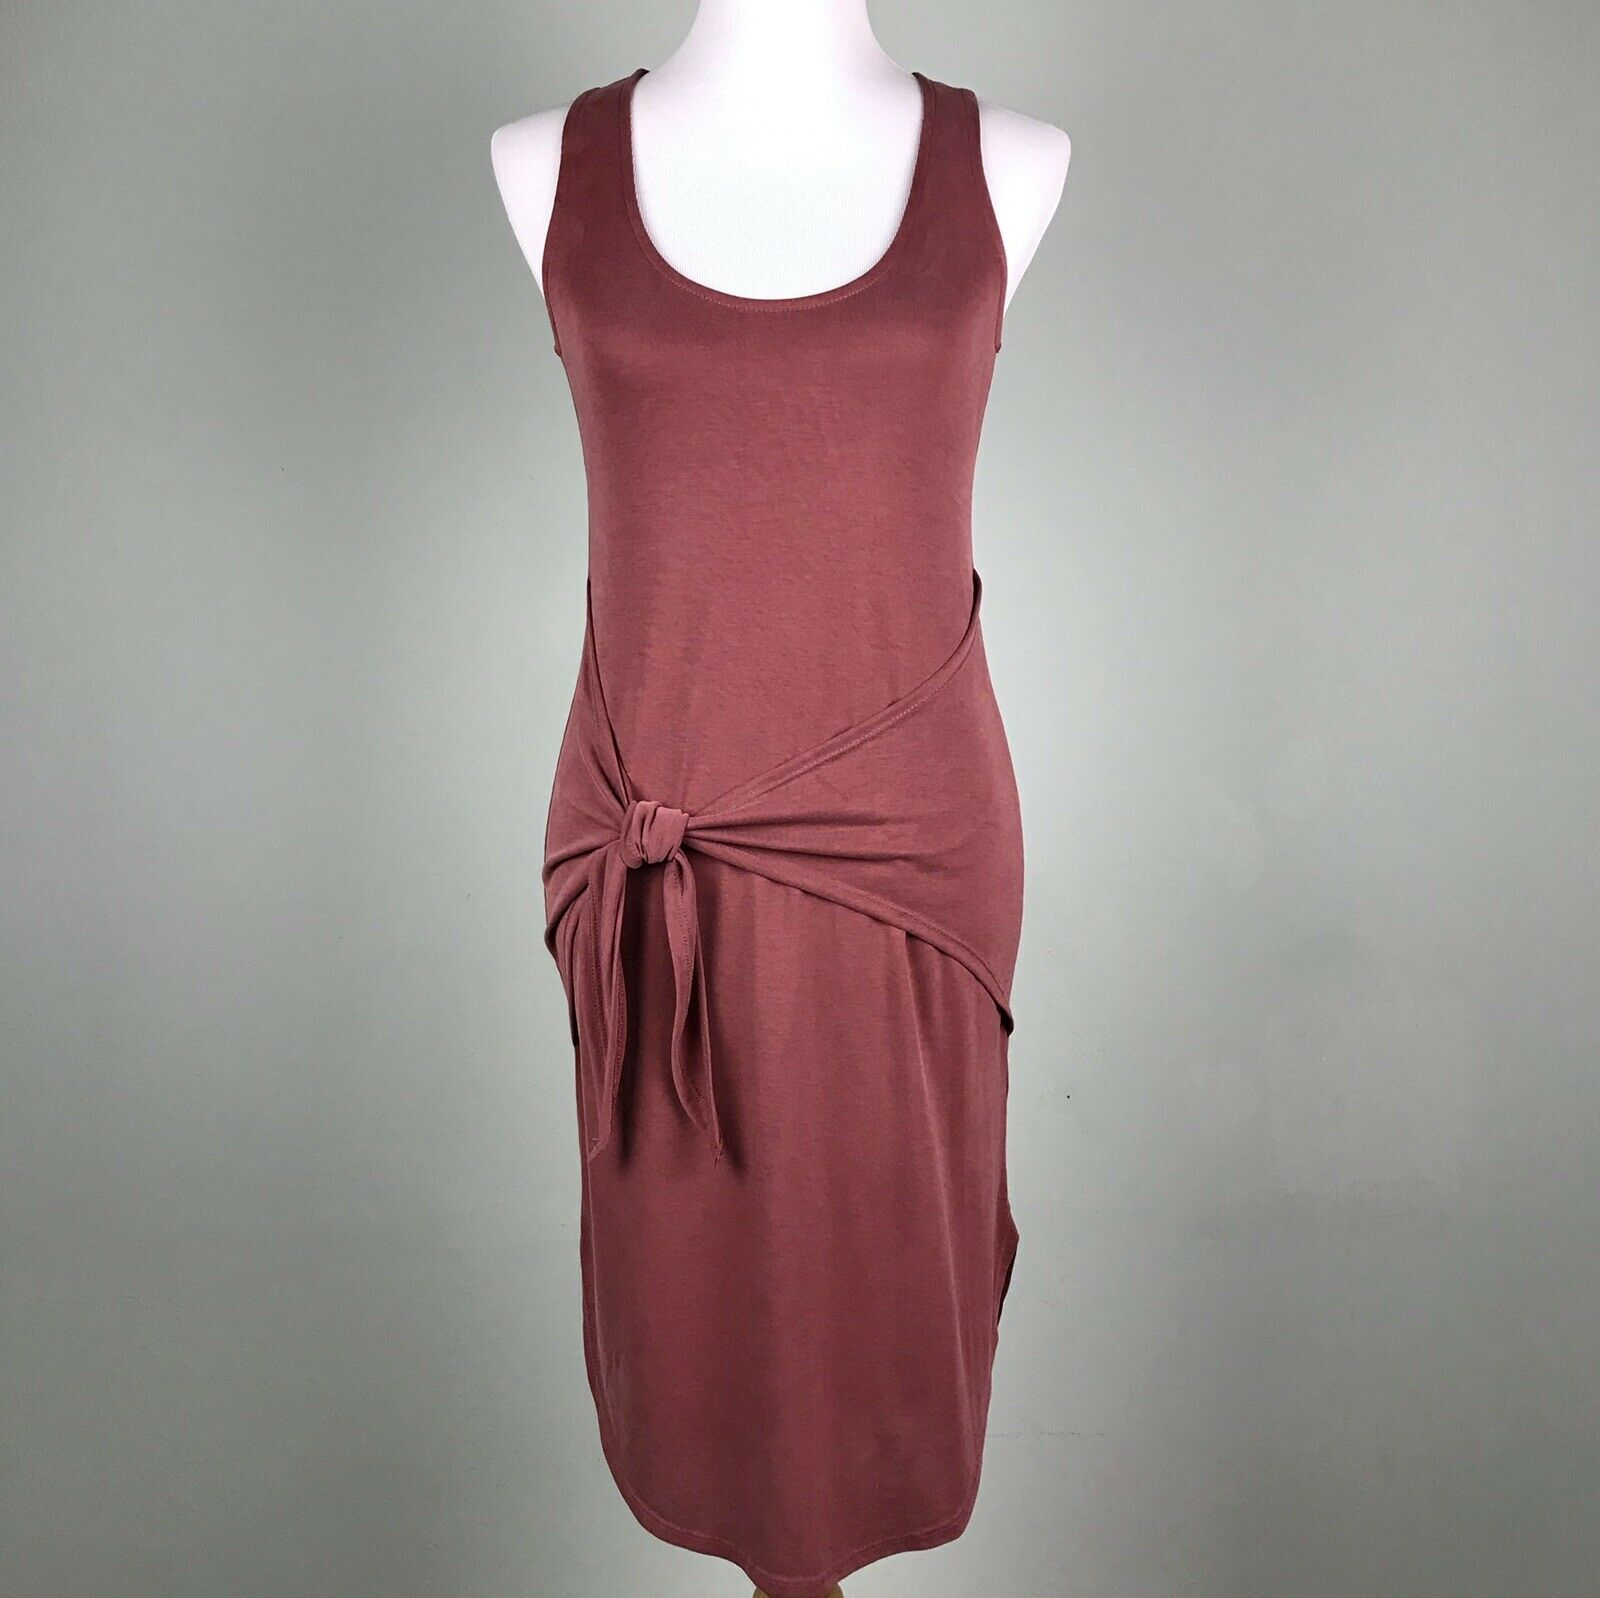 acd79b2a505 Gianni Bini Red Tank Dress Size XS 0 2 Sleeveless Tie Sash Waist Bodycon